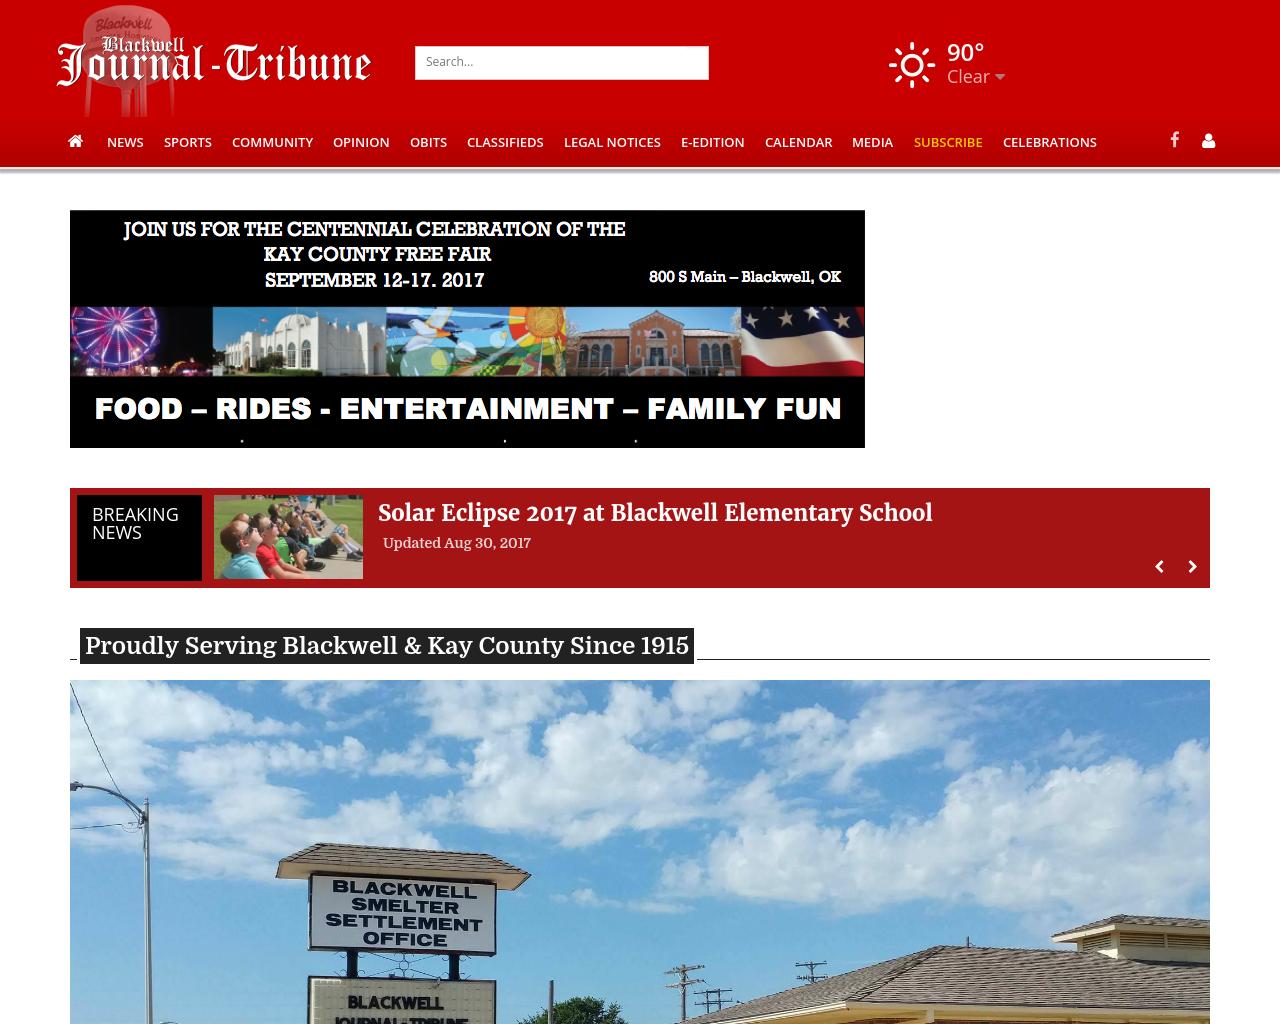 Blackwell-Journal-Tribune-Advertising-Reviews-Pricing